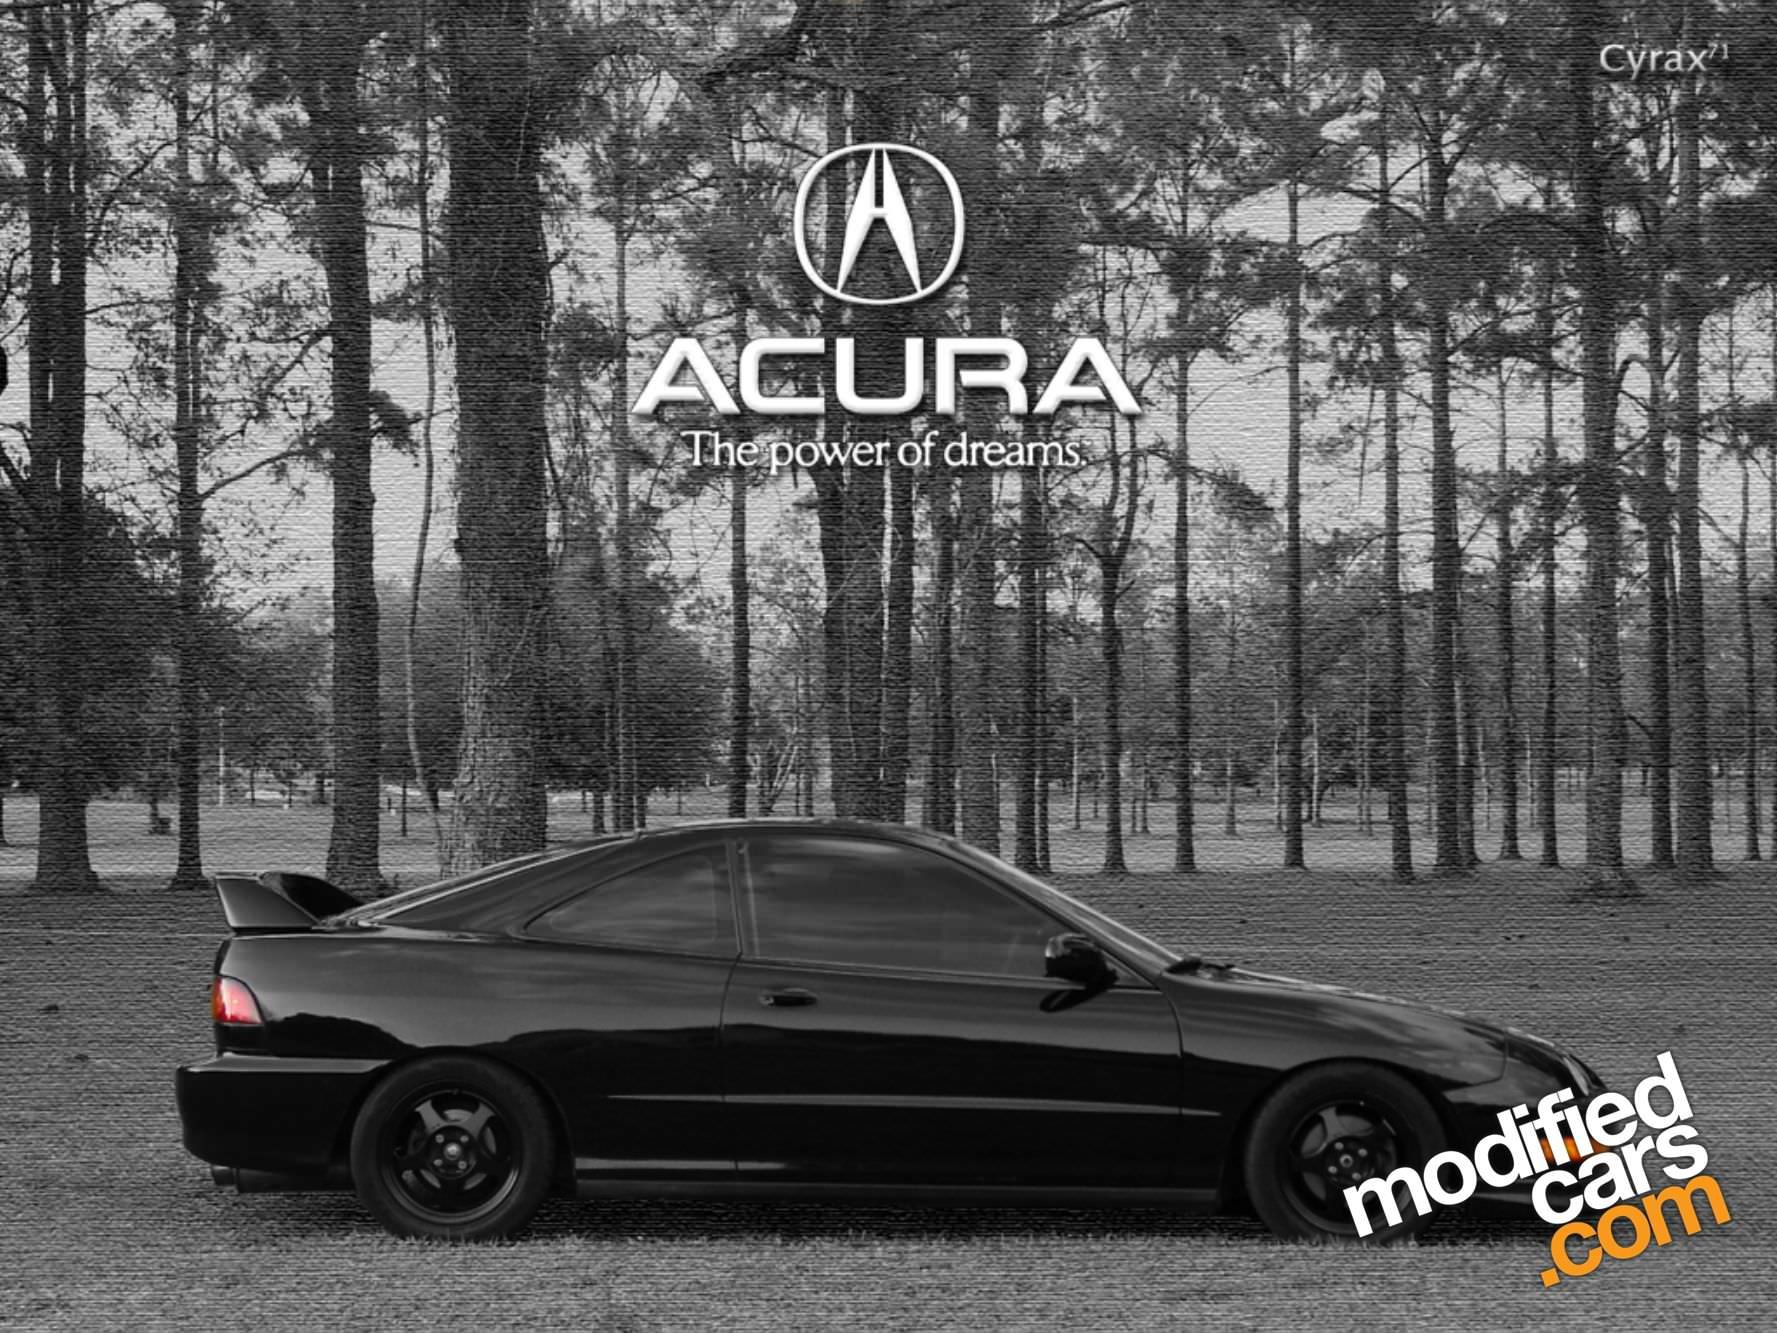 Acura integra typer japan coupe sedan cars tuning wallpaper 1280x1024 acura integra wallpapers 42 wallpapers adorable wallpapers